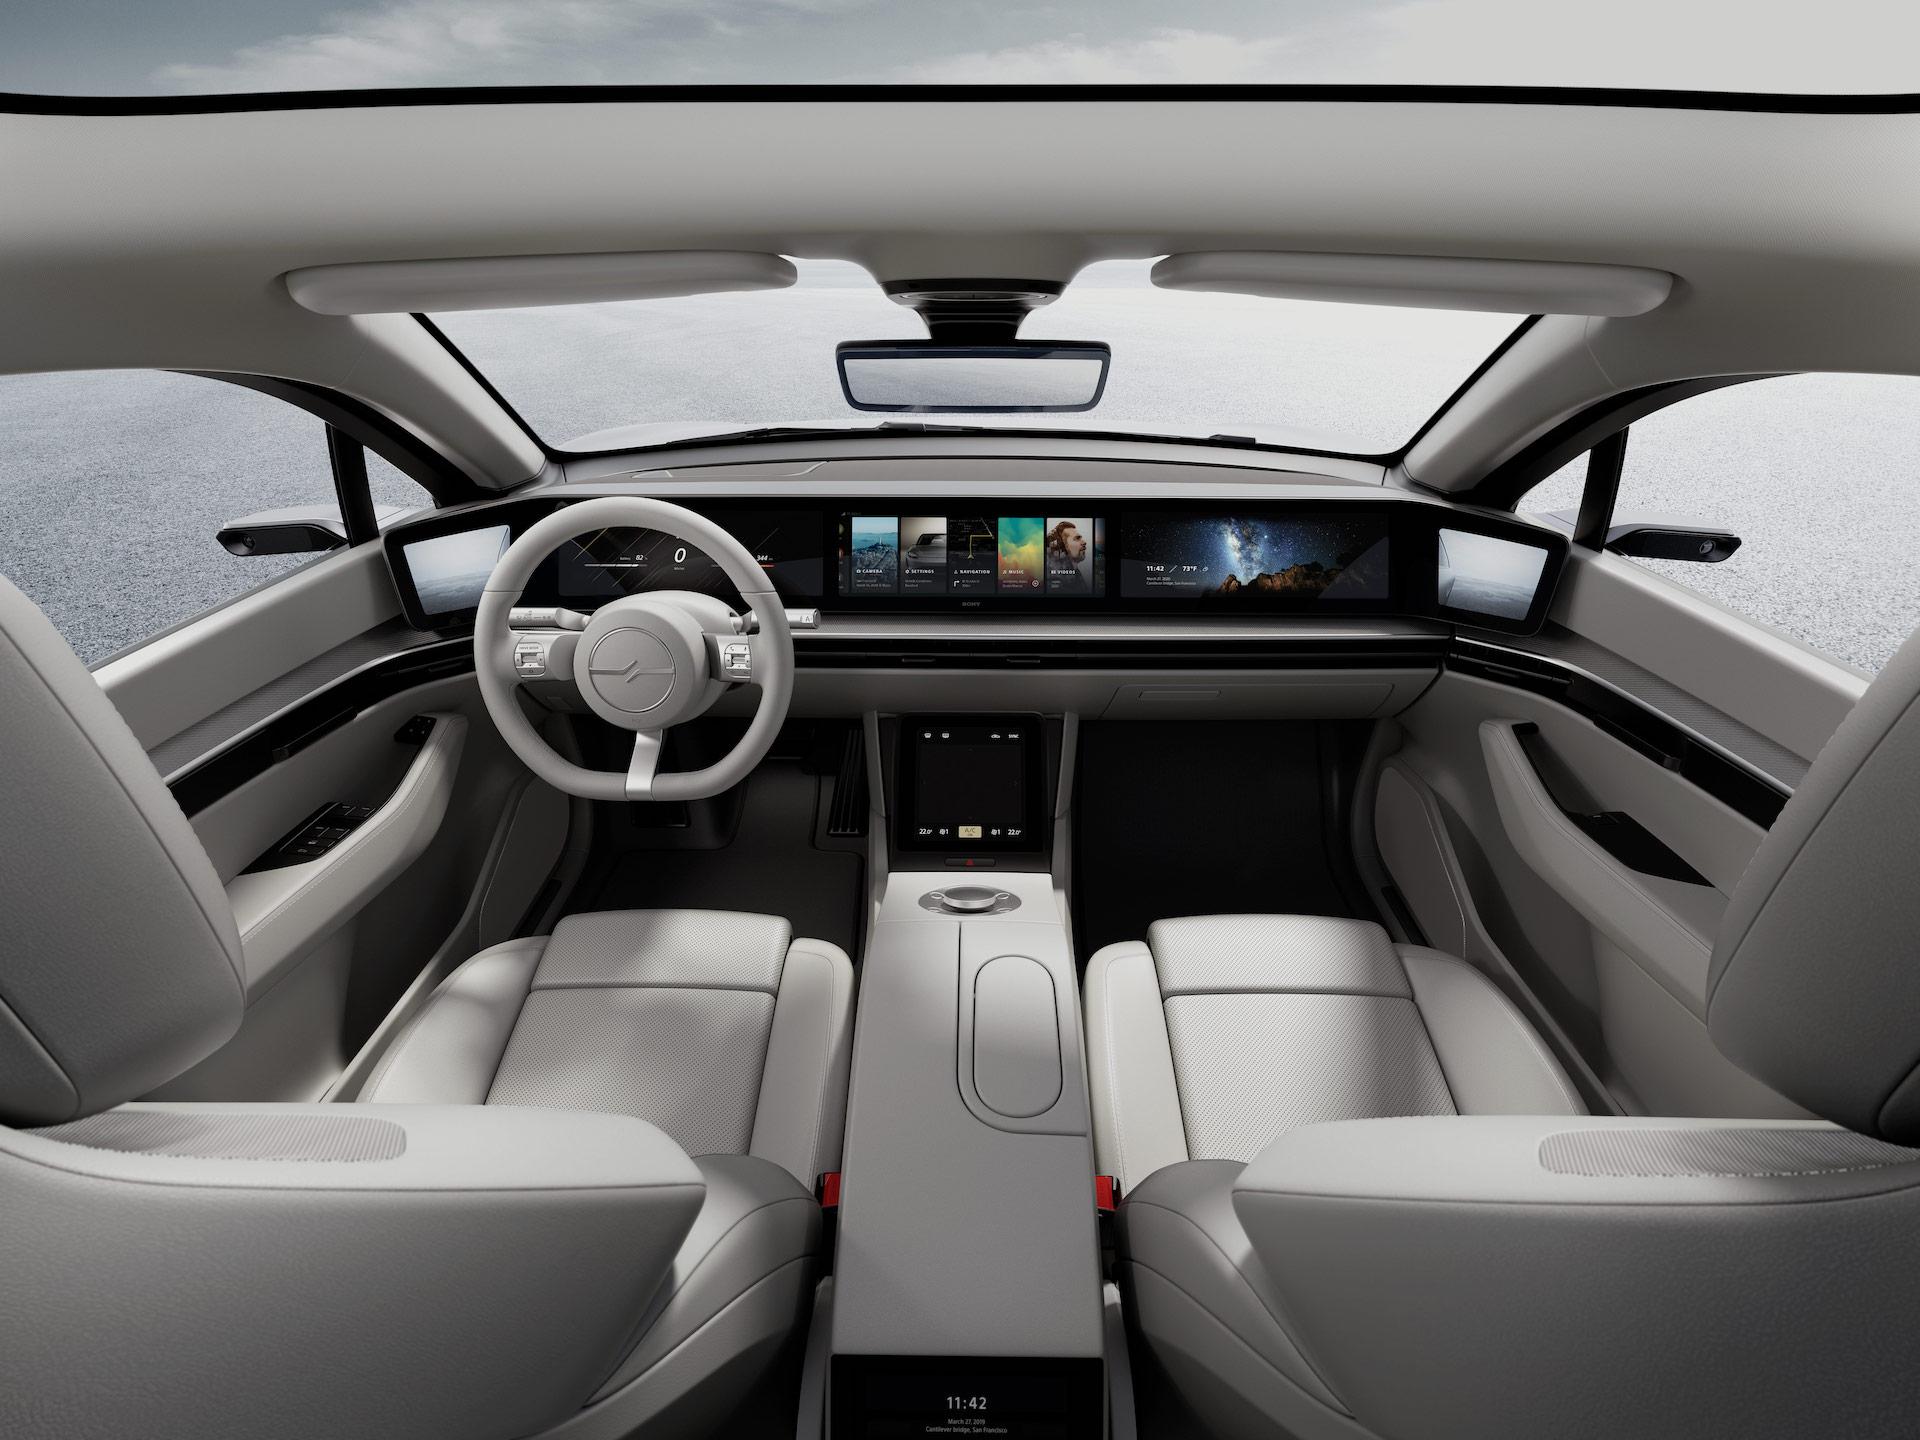 Vision S: Sony präsentiert den Prototypen eines eigenen Elektroautos 9